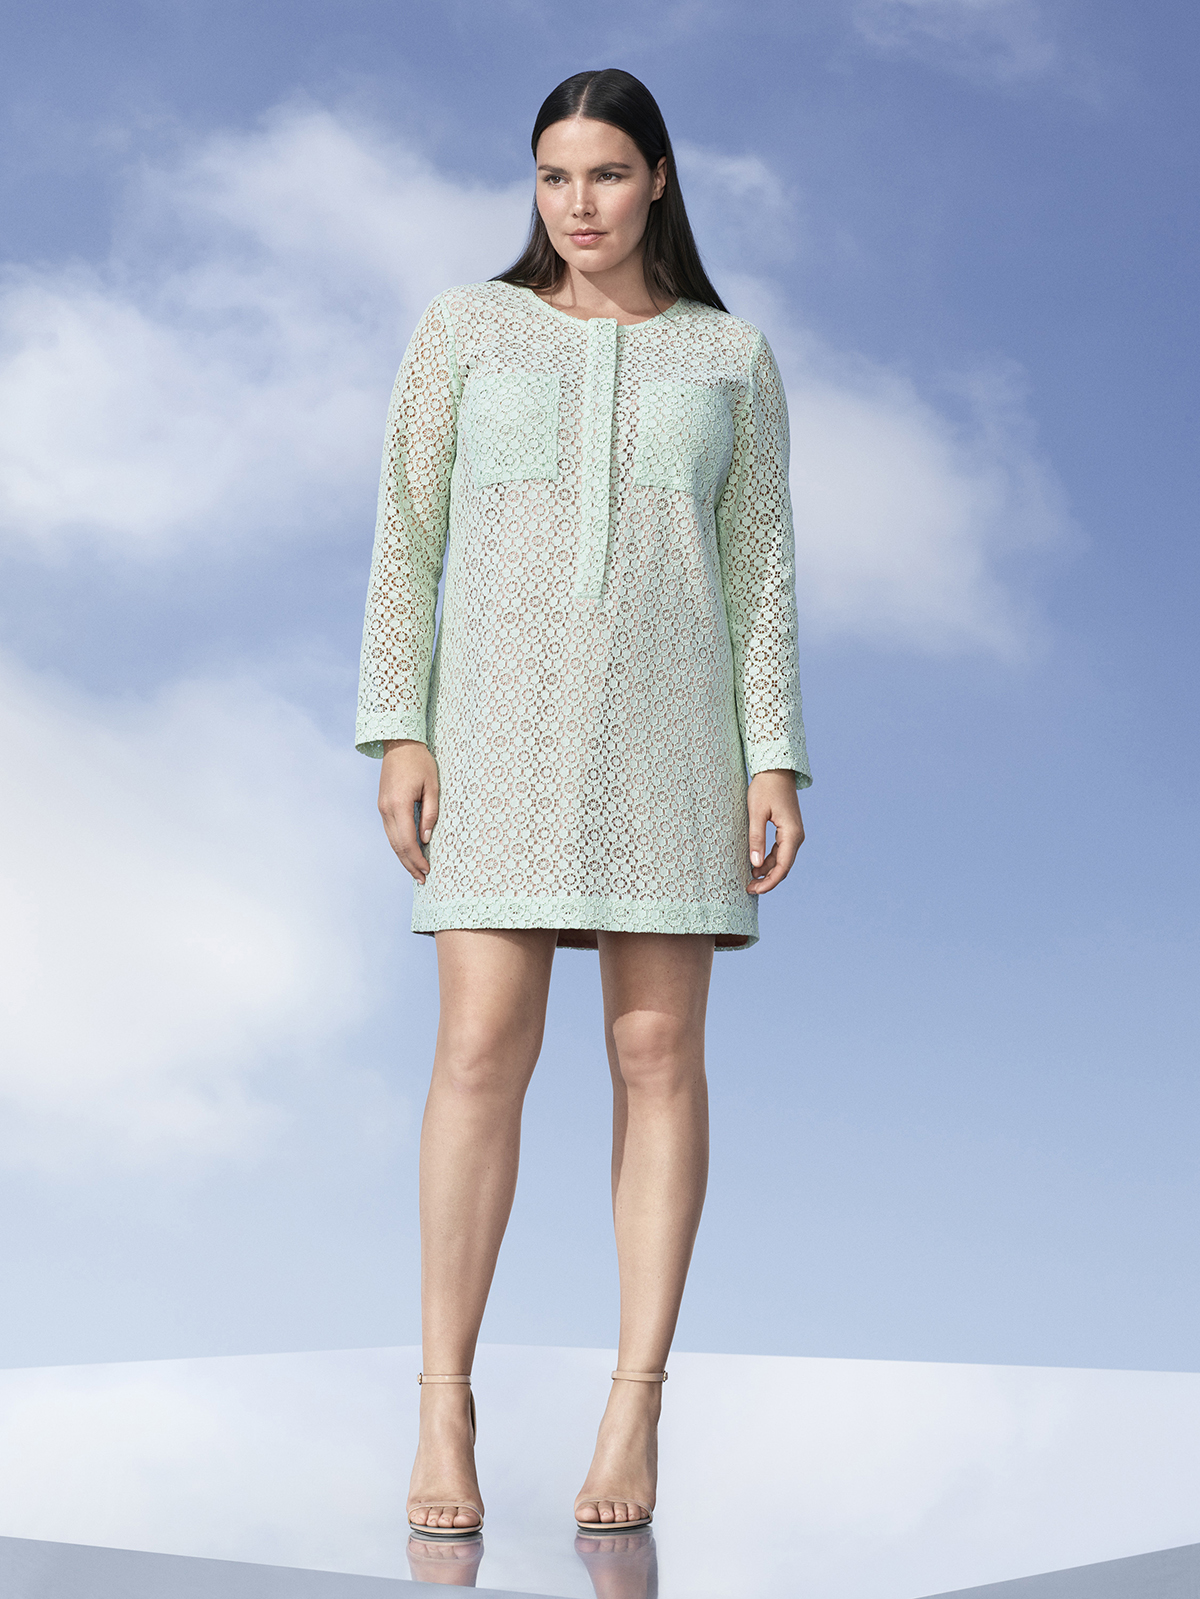 Mint Green Lace Dress, $40